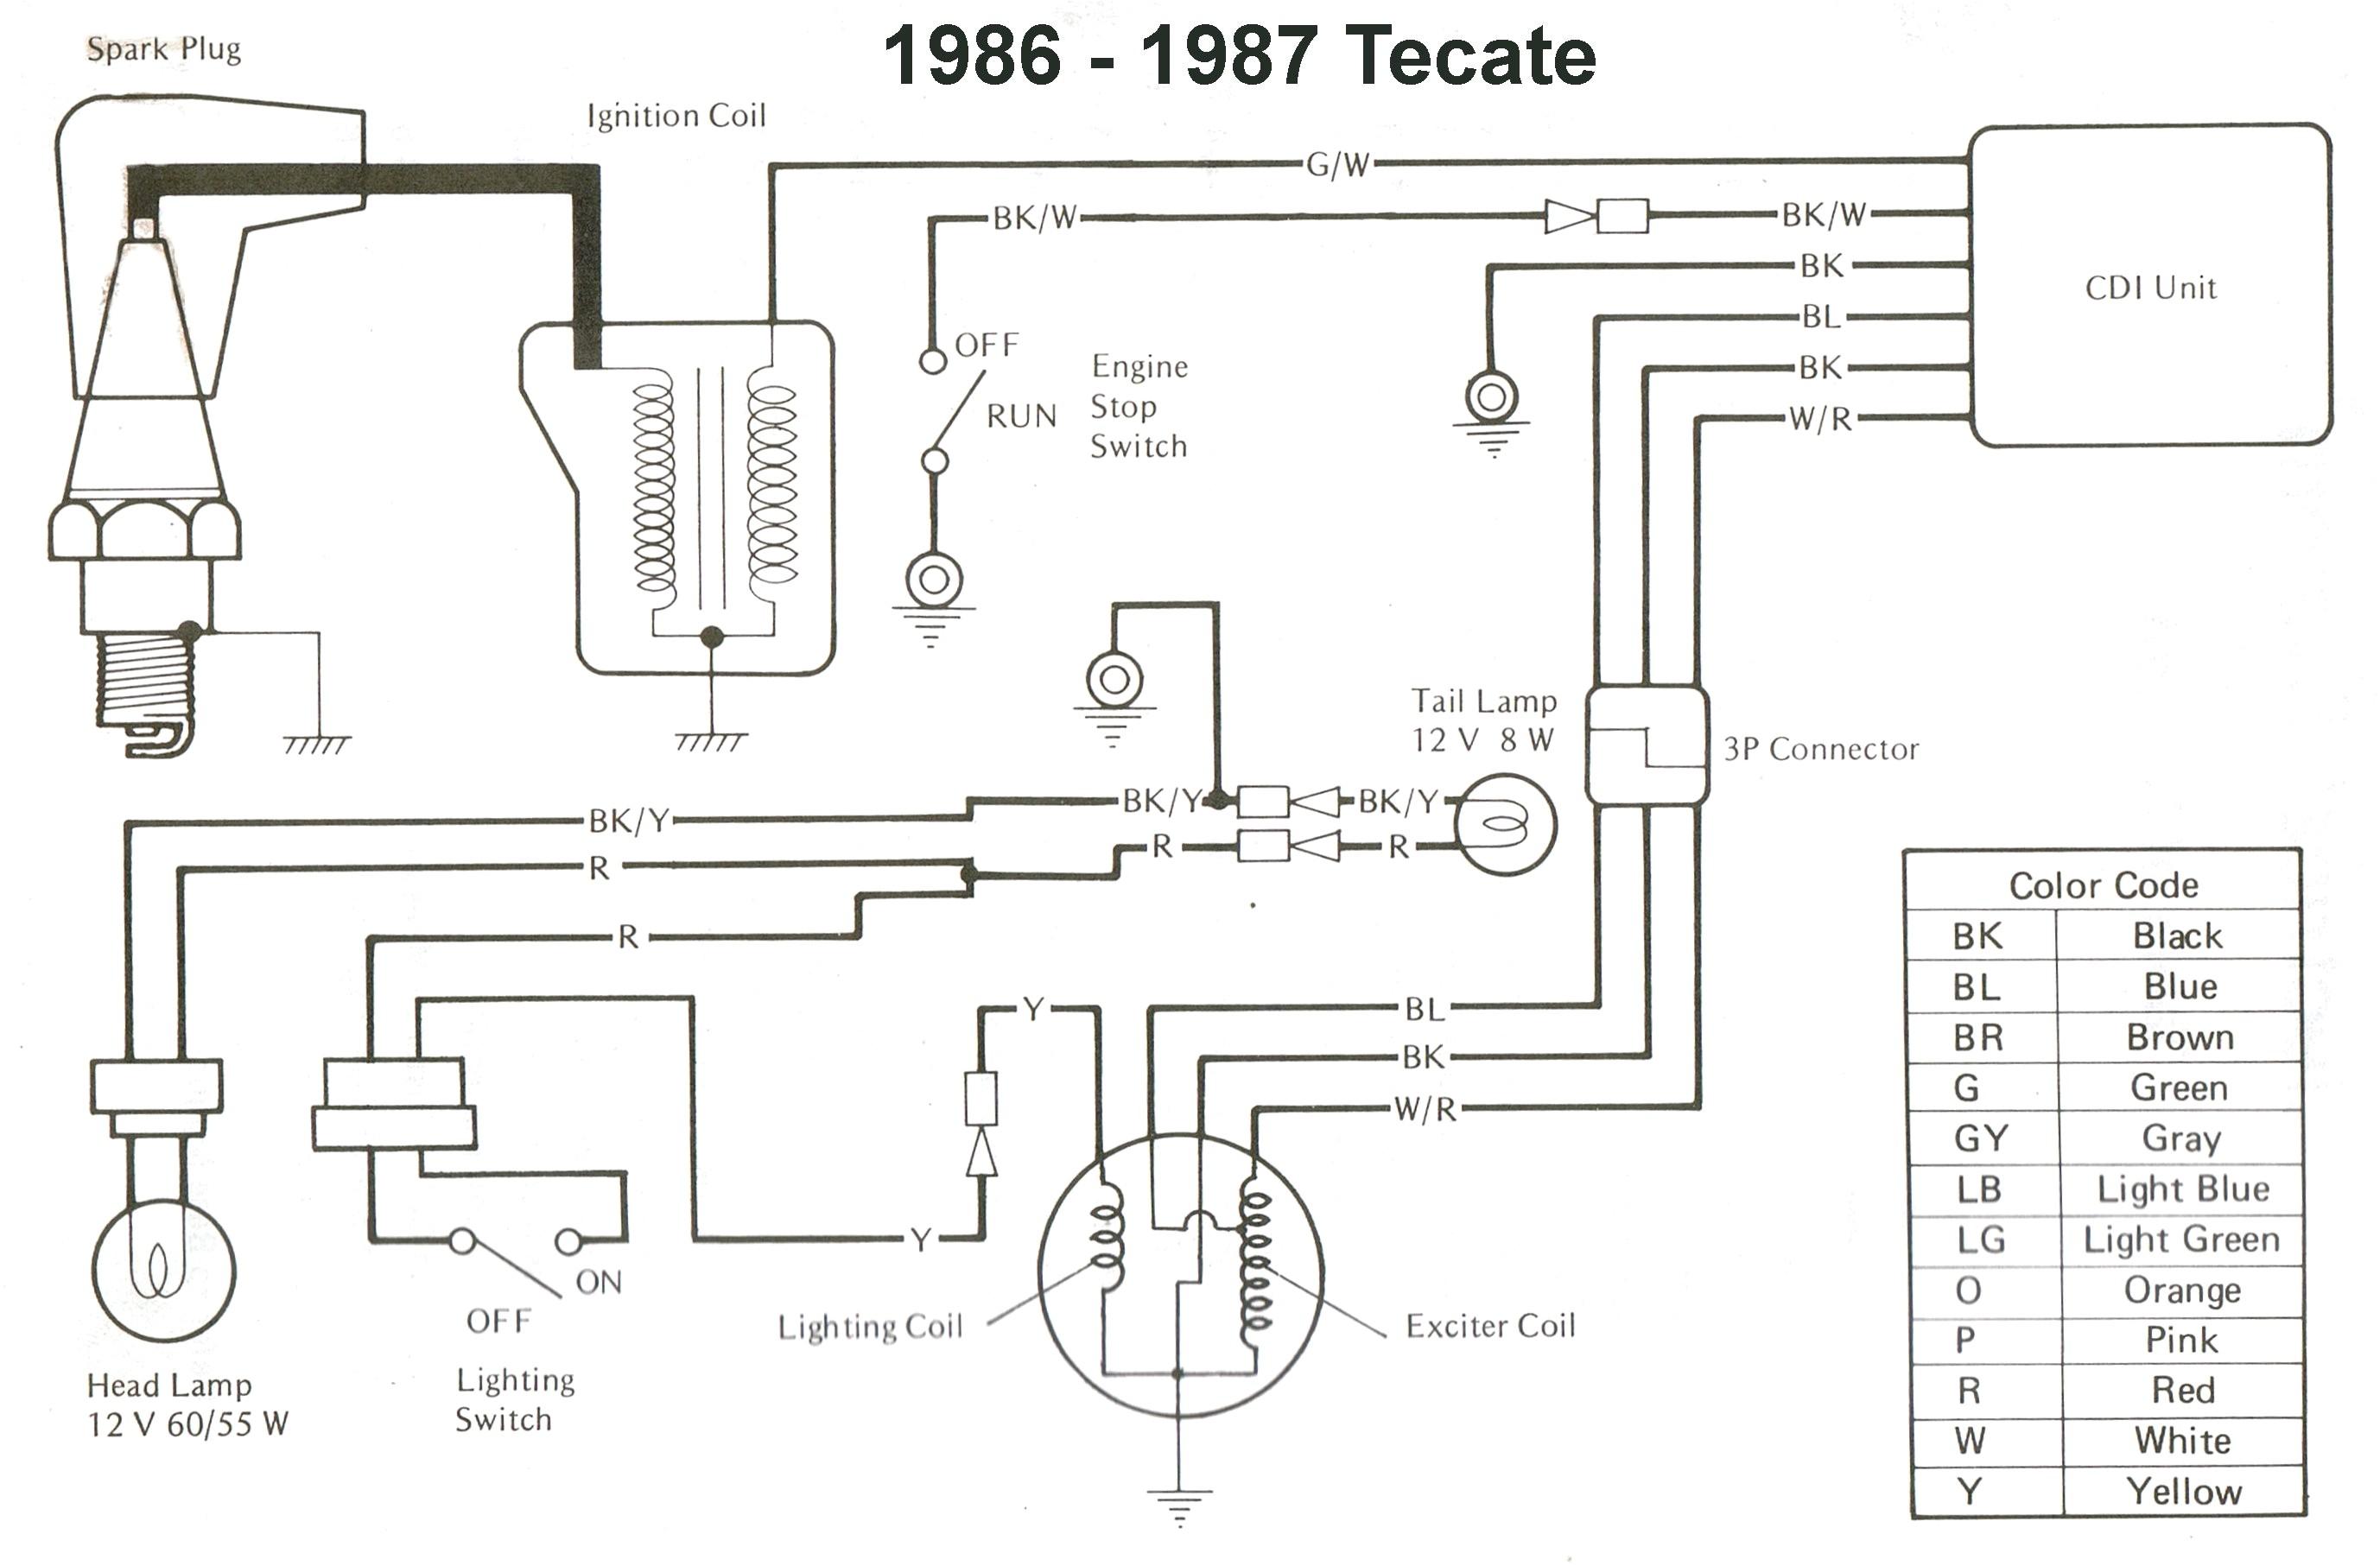 suzuki alto wiring diagram wiring diagram expertsuzuki bolan wiring diagram 20